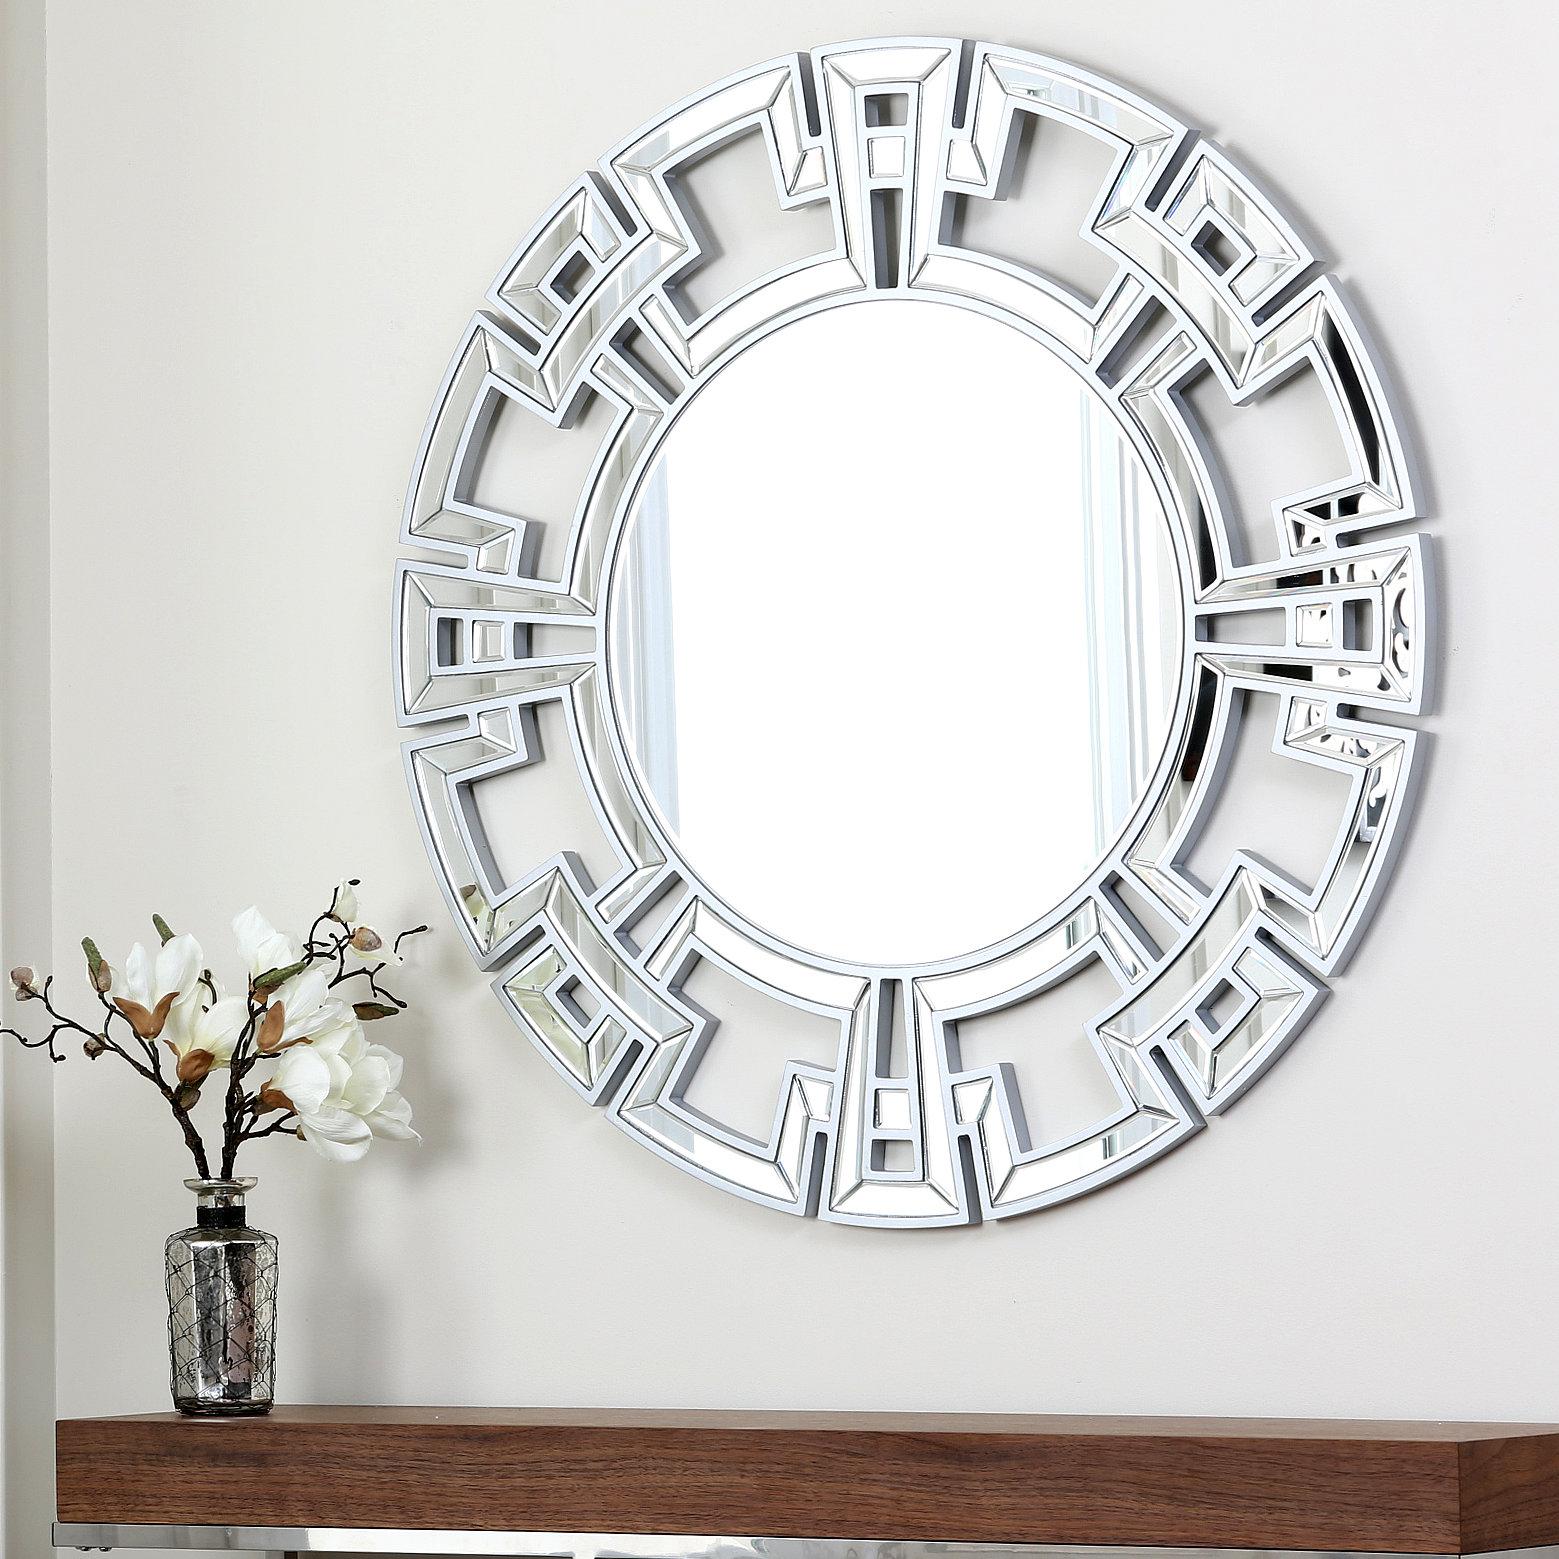 Willa Arlo Interiors Tata Openwork Round Wall Mirror Regarding Dandre Wall Mirrors (View 16 of 20)